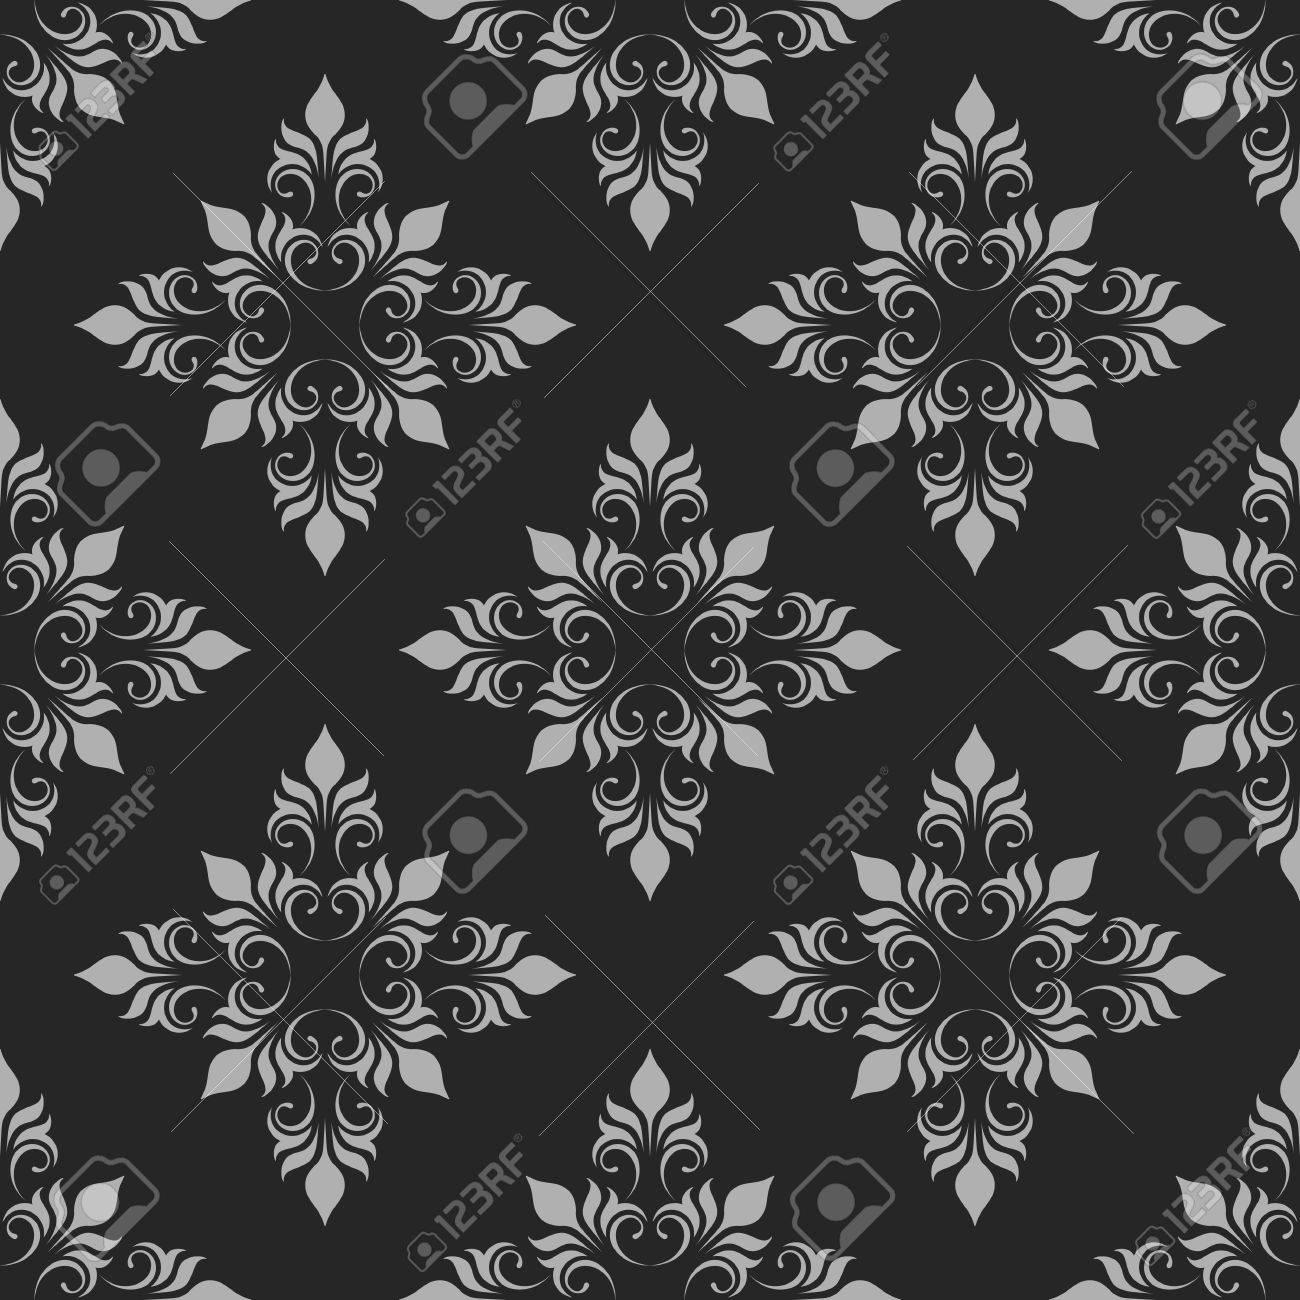 Dark Seamless Pattern. Classical Ornament. Decorative Background. - 64883274